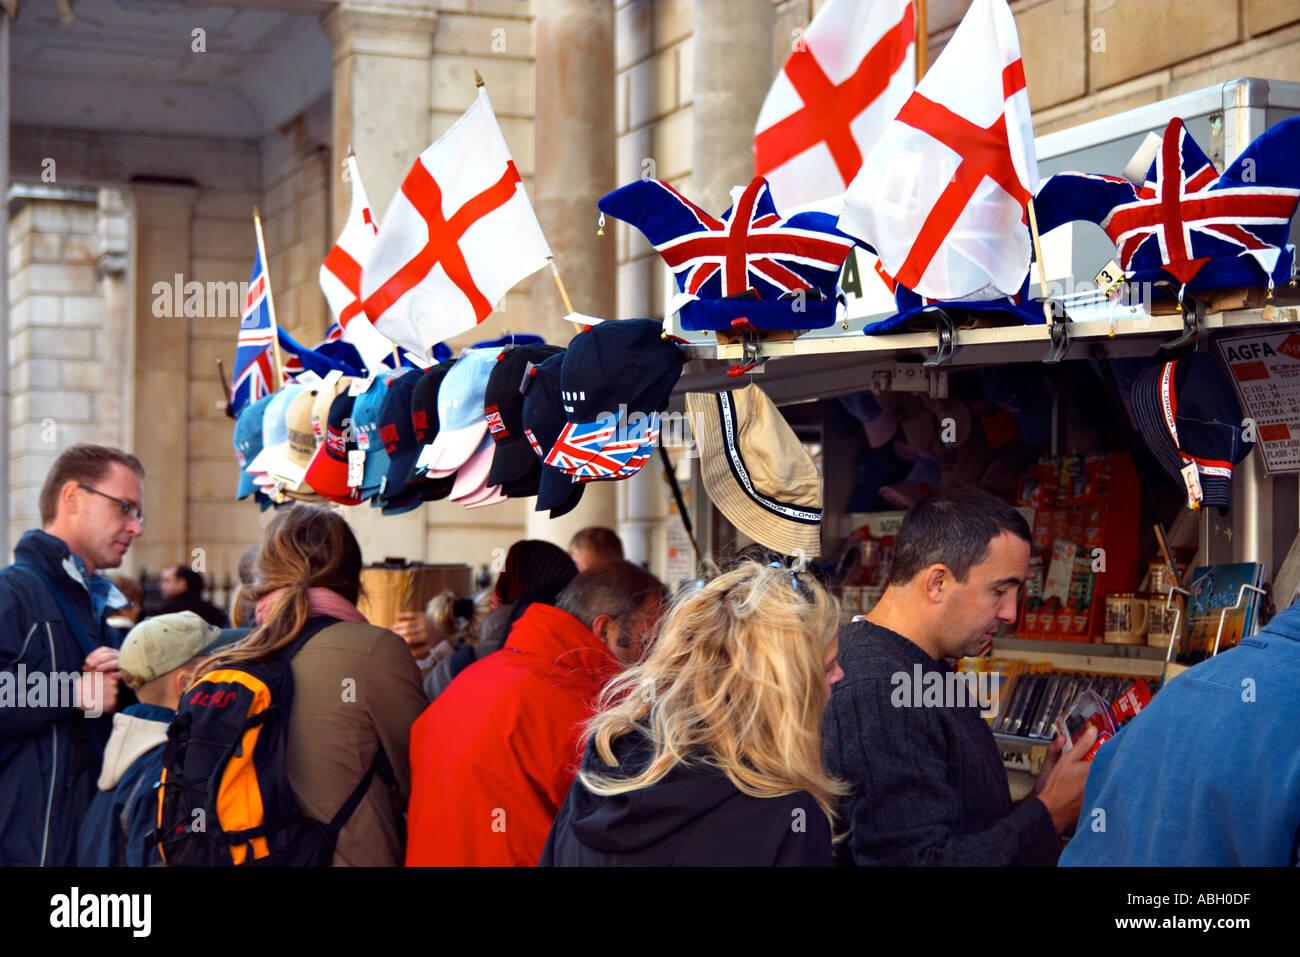 london souvenir stall tourist tourism visit england uk united kingdom britain buy consumerism - Stock Image